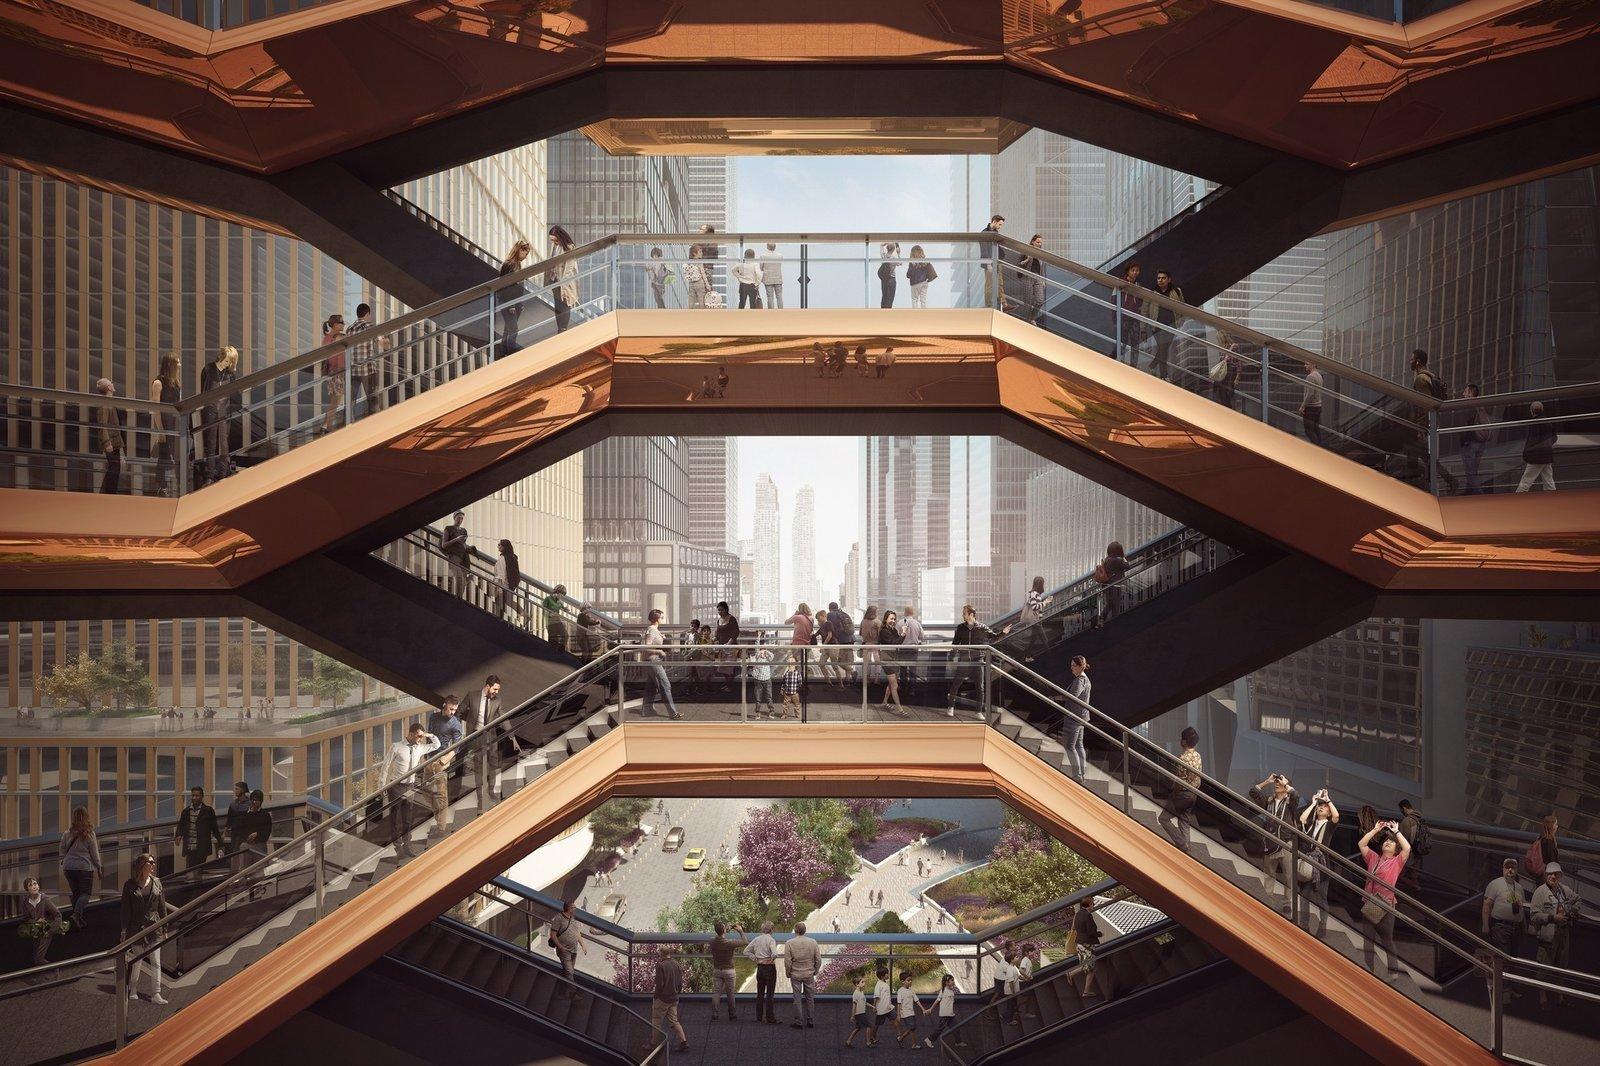 Photo 3 of 4 in A New Kind of Public Landmark: New York's Interactive Centerpiece by Heatherwick Studio